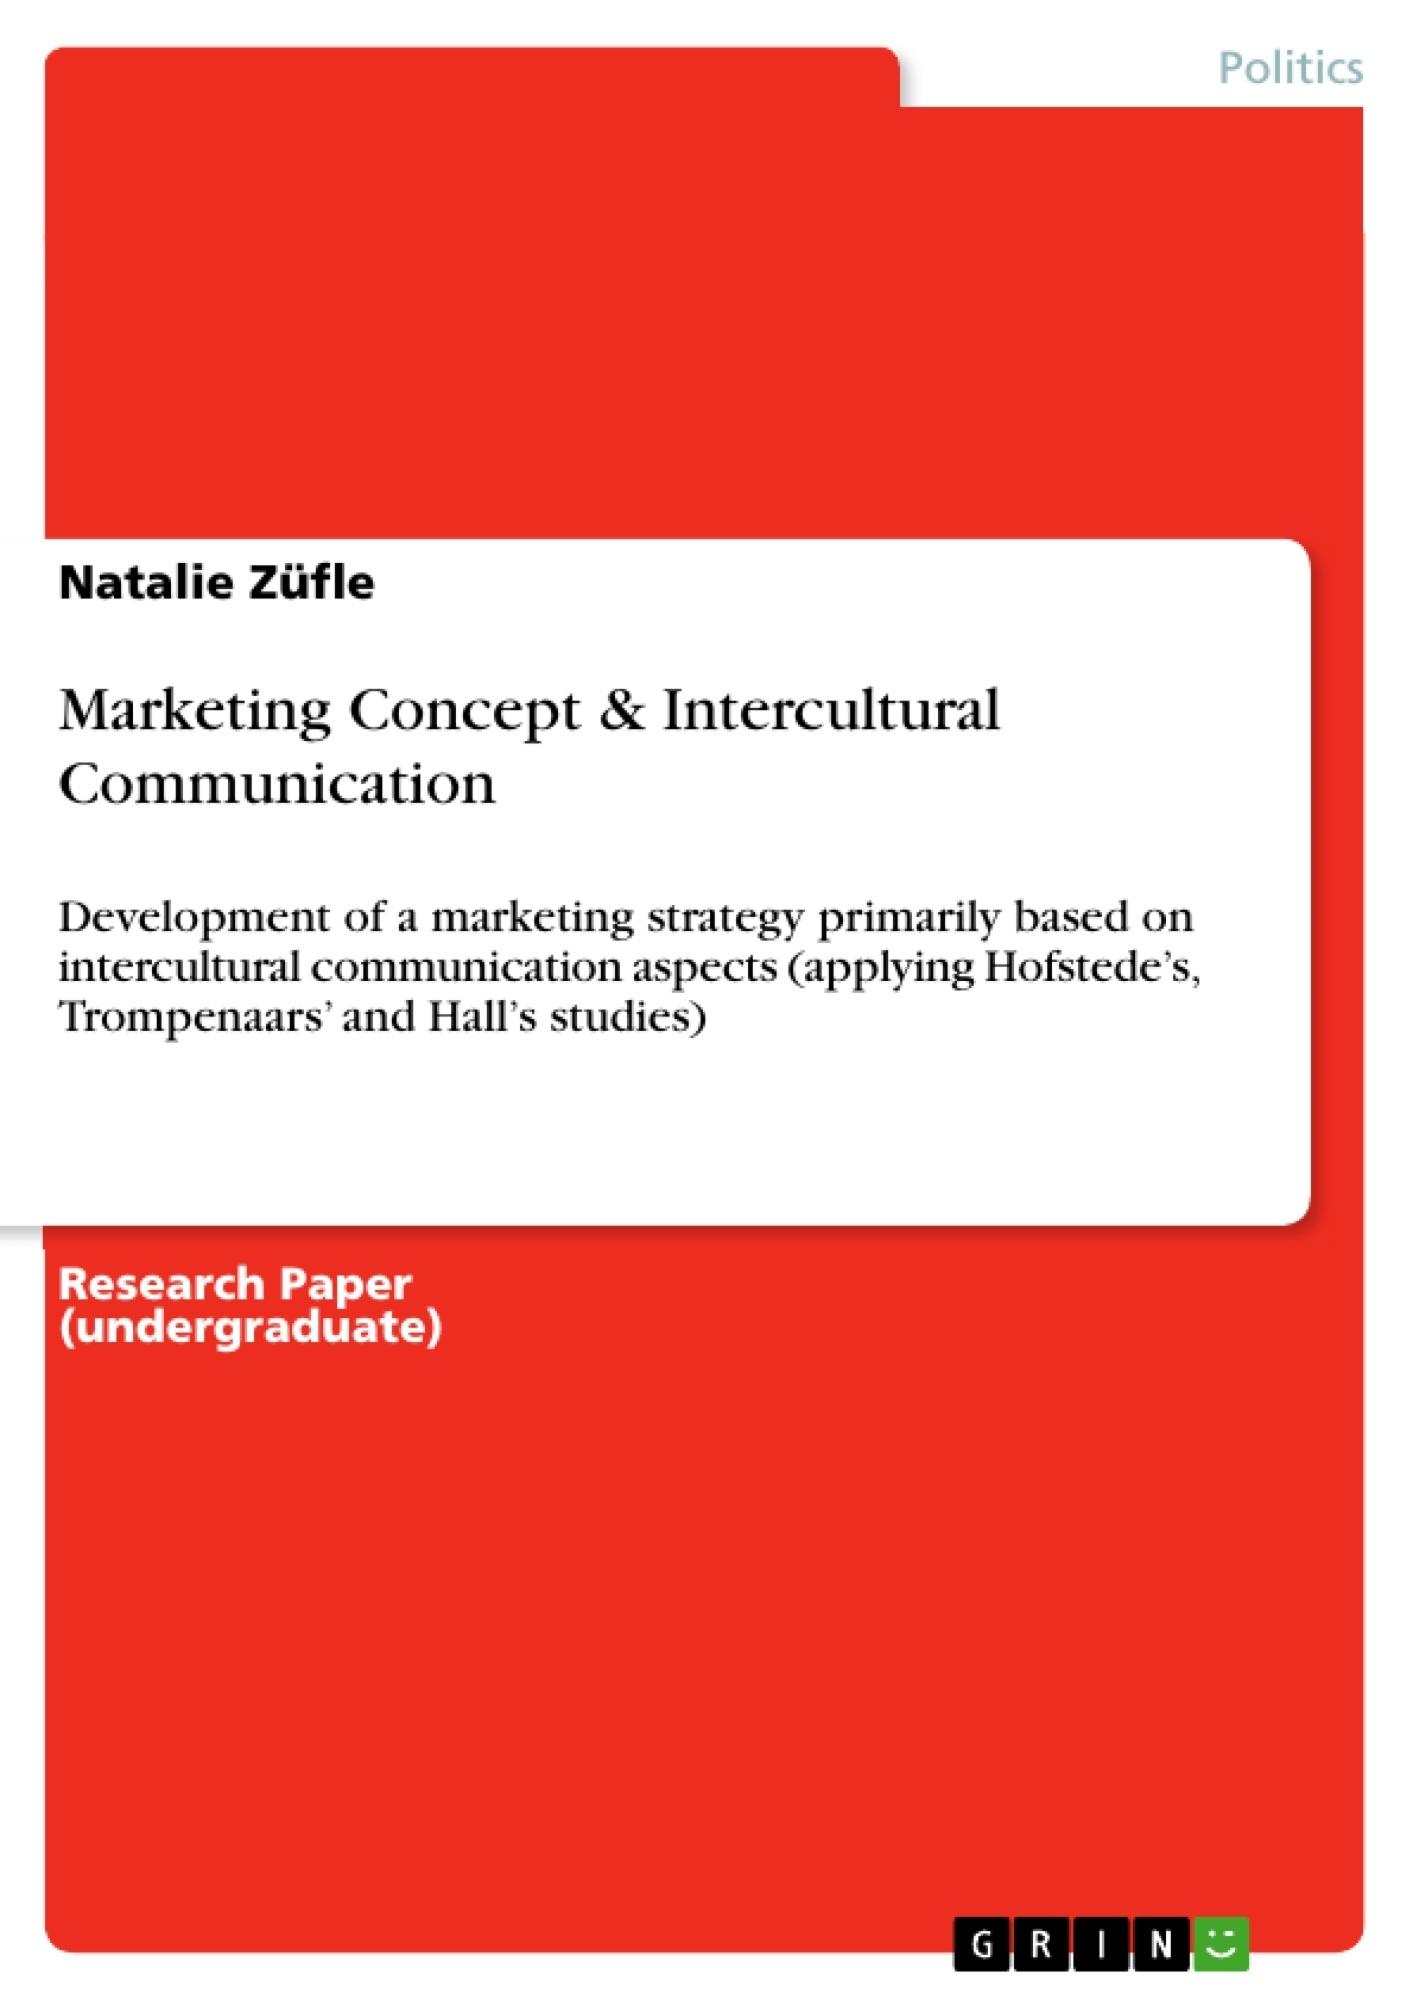 Title: Marketing Concept & Intercultural Communication